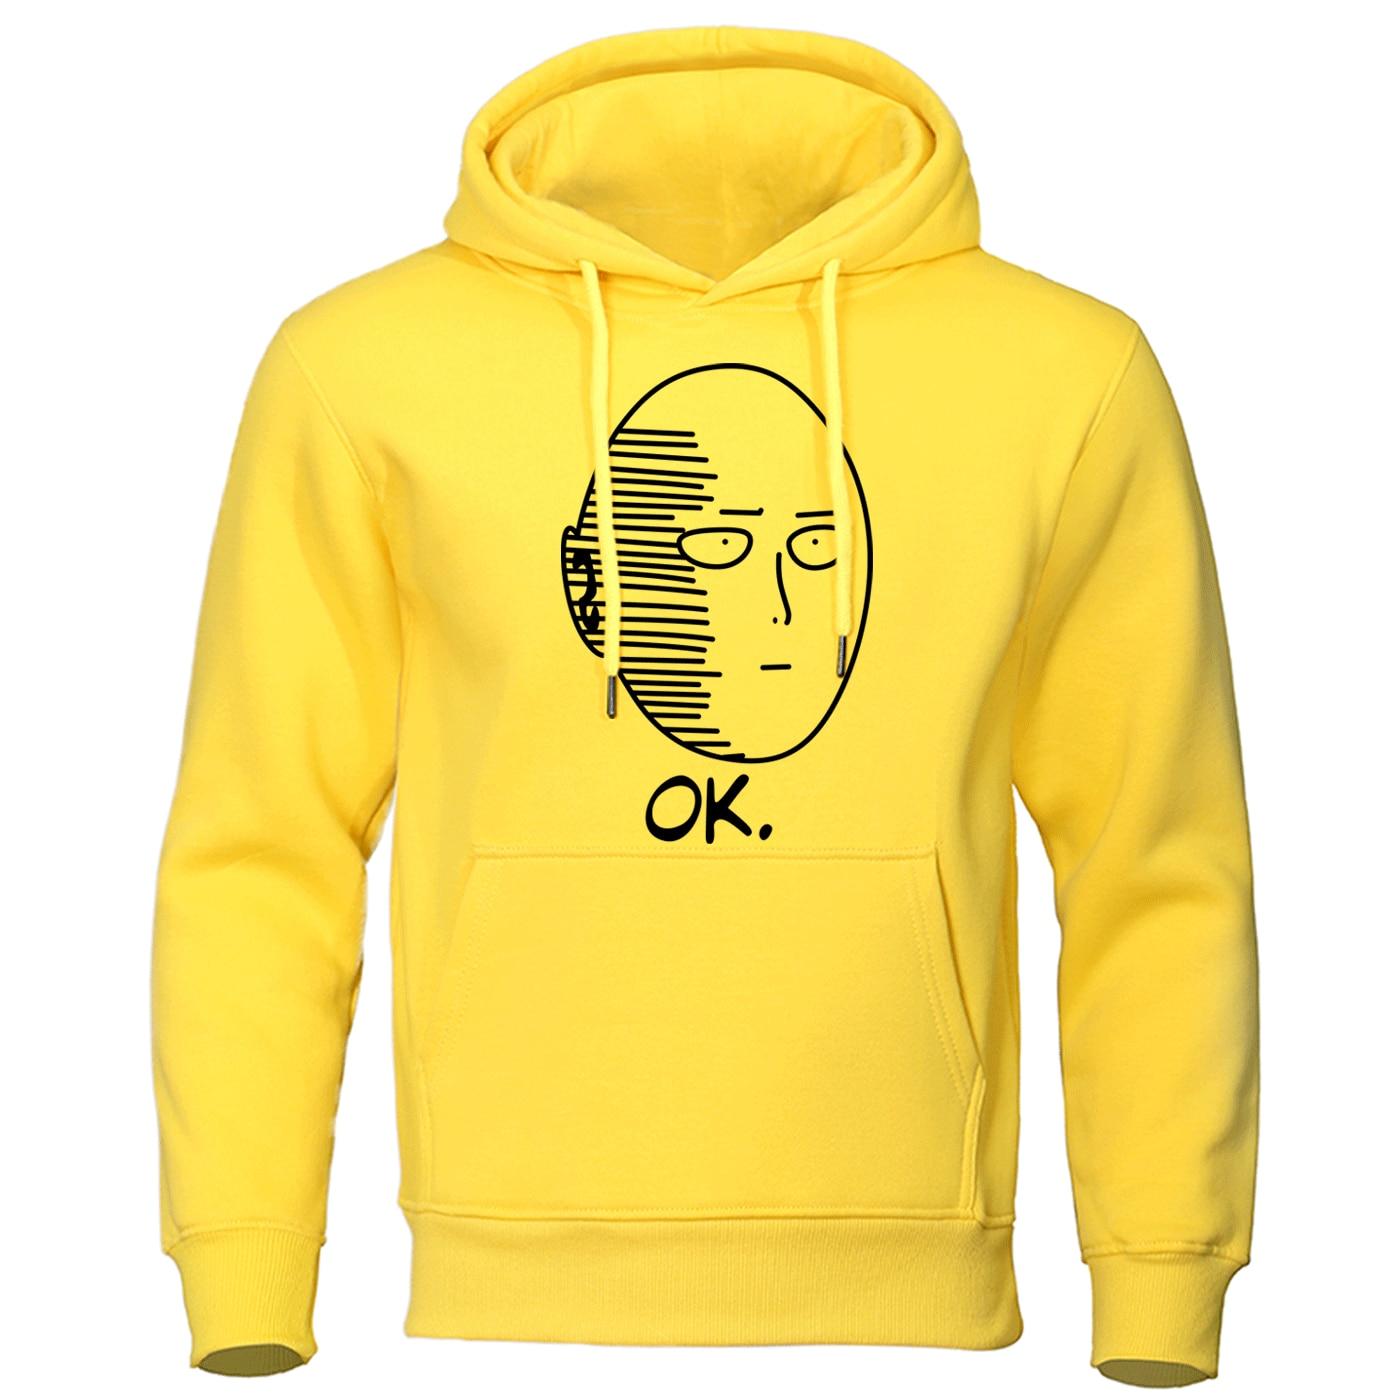 Autumn Casual Hooded Sweatshirt One Punch Man Hoodie Japanese Anime Men Pullover Harajuku Saitama Sensei Mens Fashion Streetwear